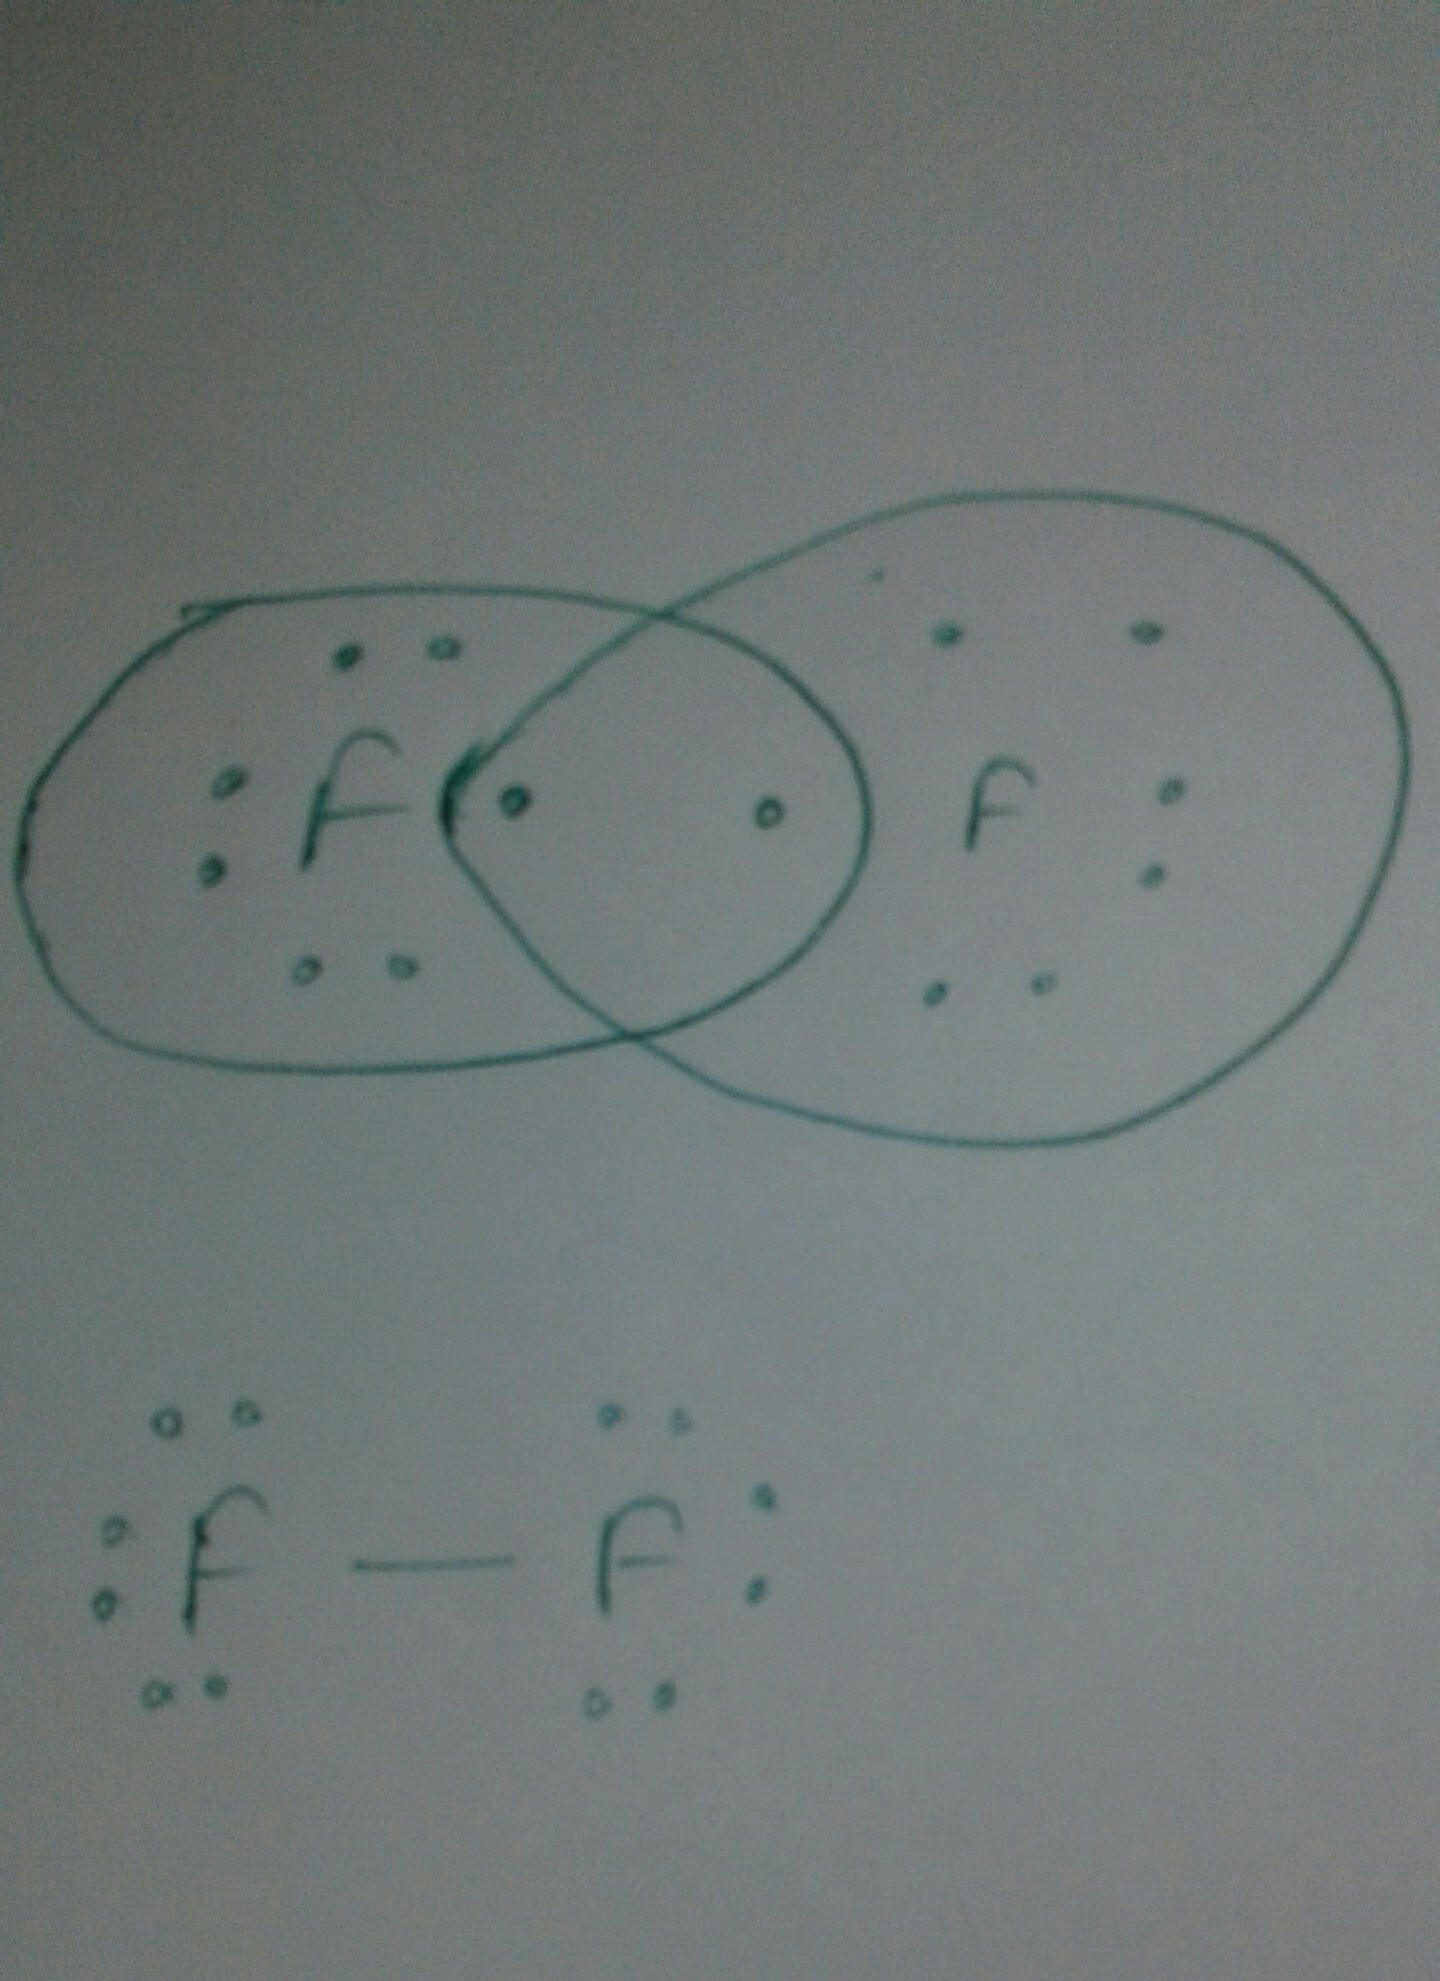 Fluorine Dot Diagram : fluorine, diagram, Electron, Structure, Brainly.in